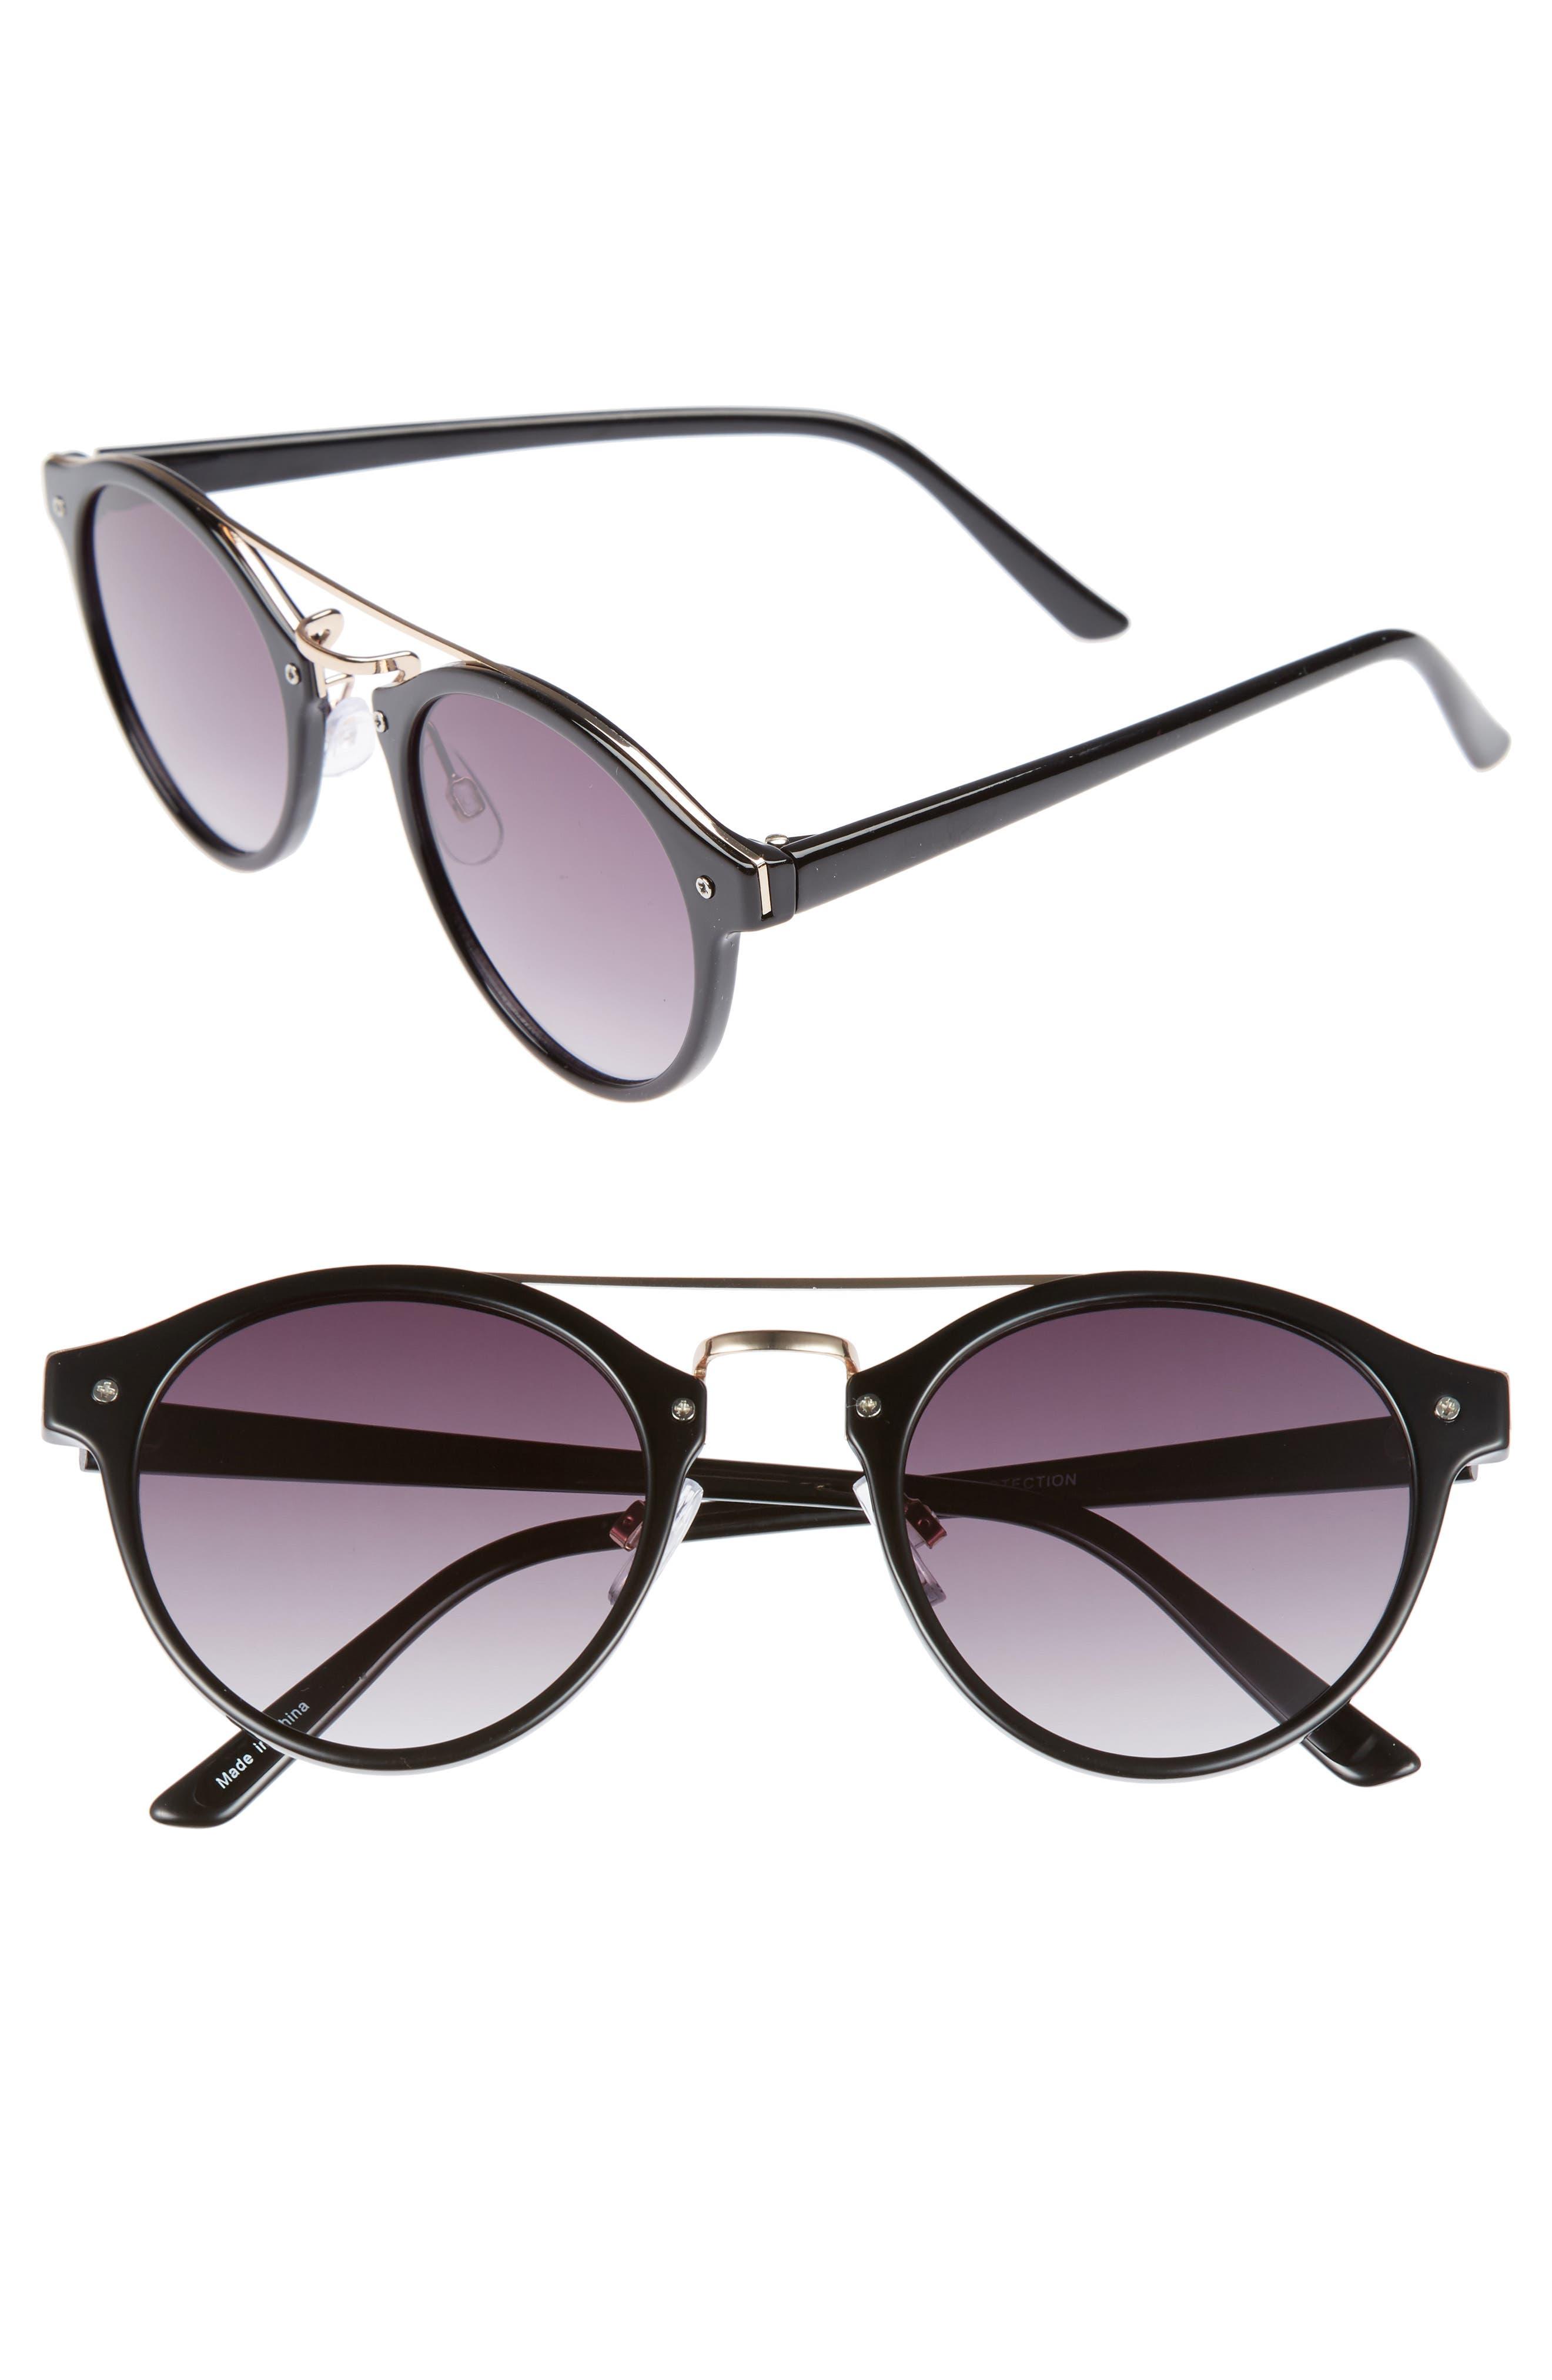 45mm Round Sunglasses,                         Main,                         color, Black/ Gold